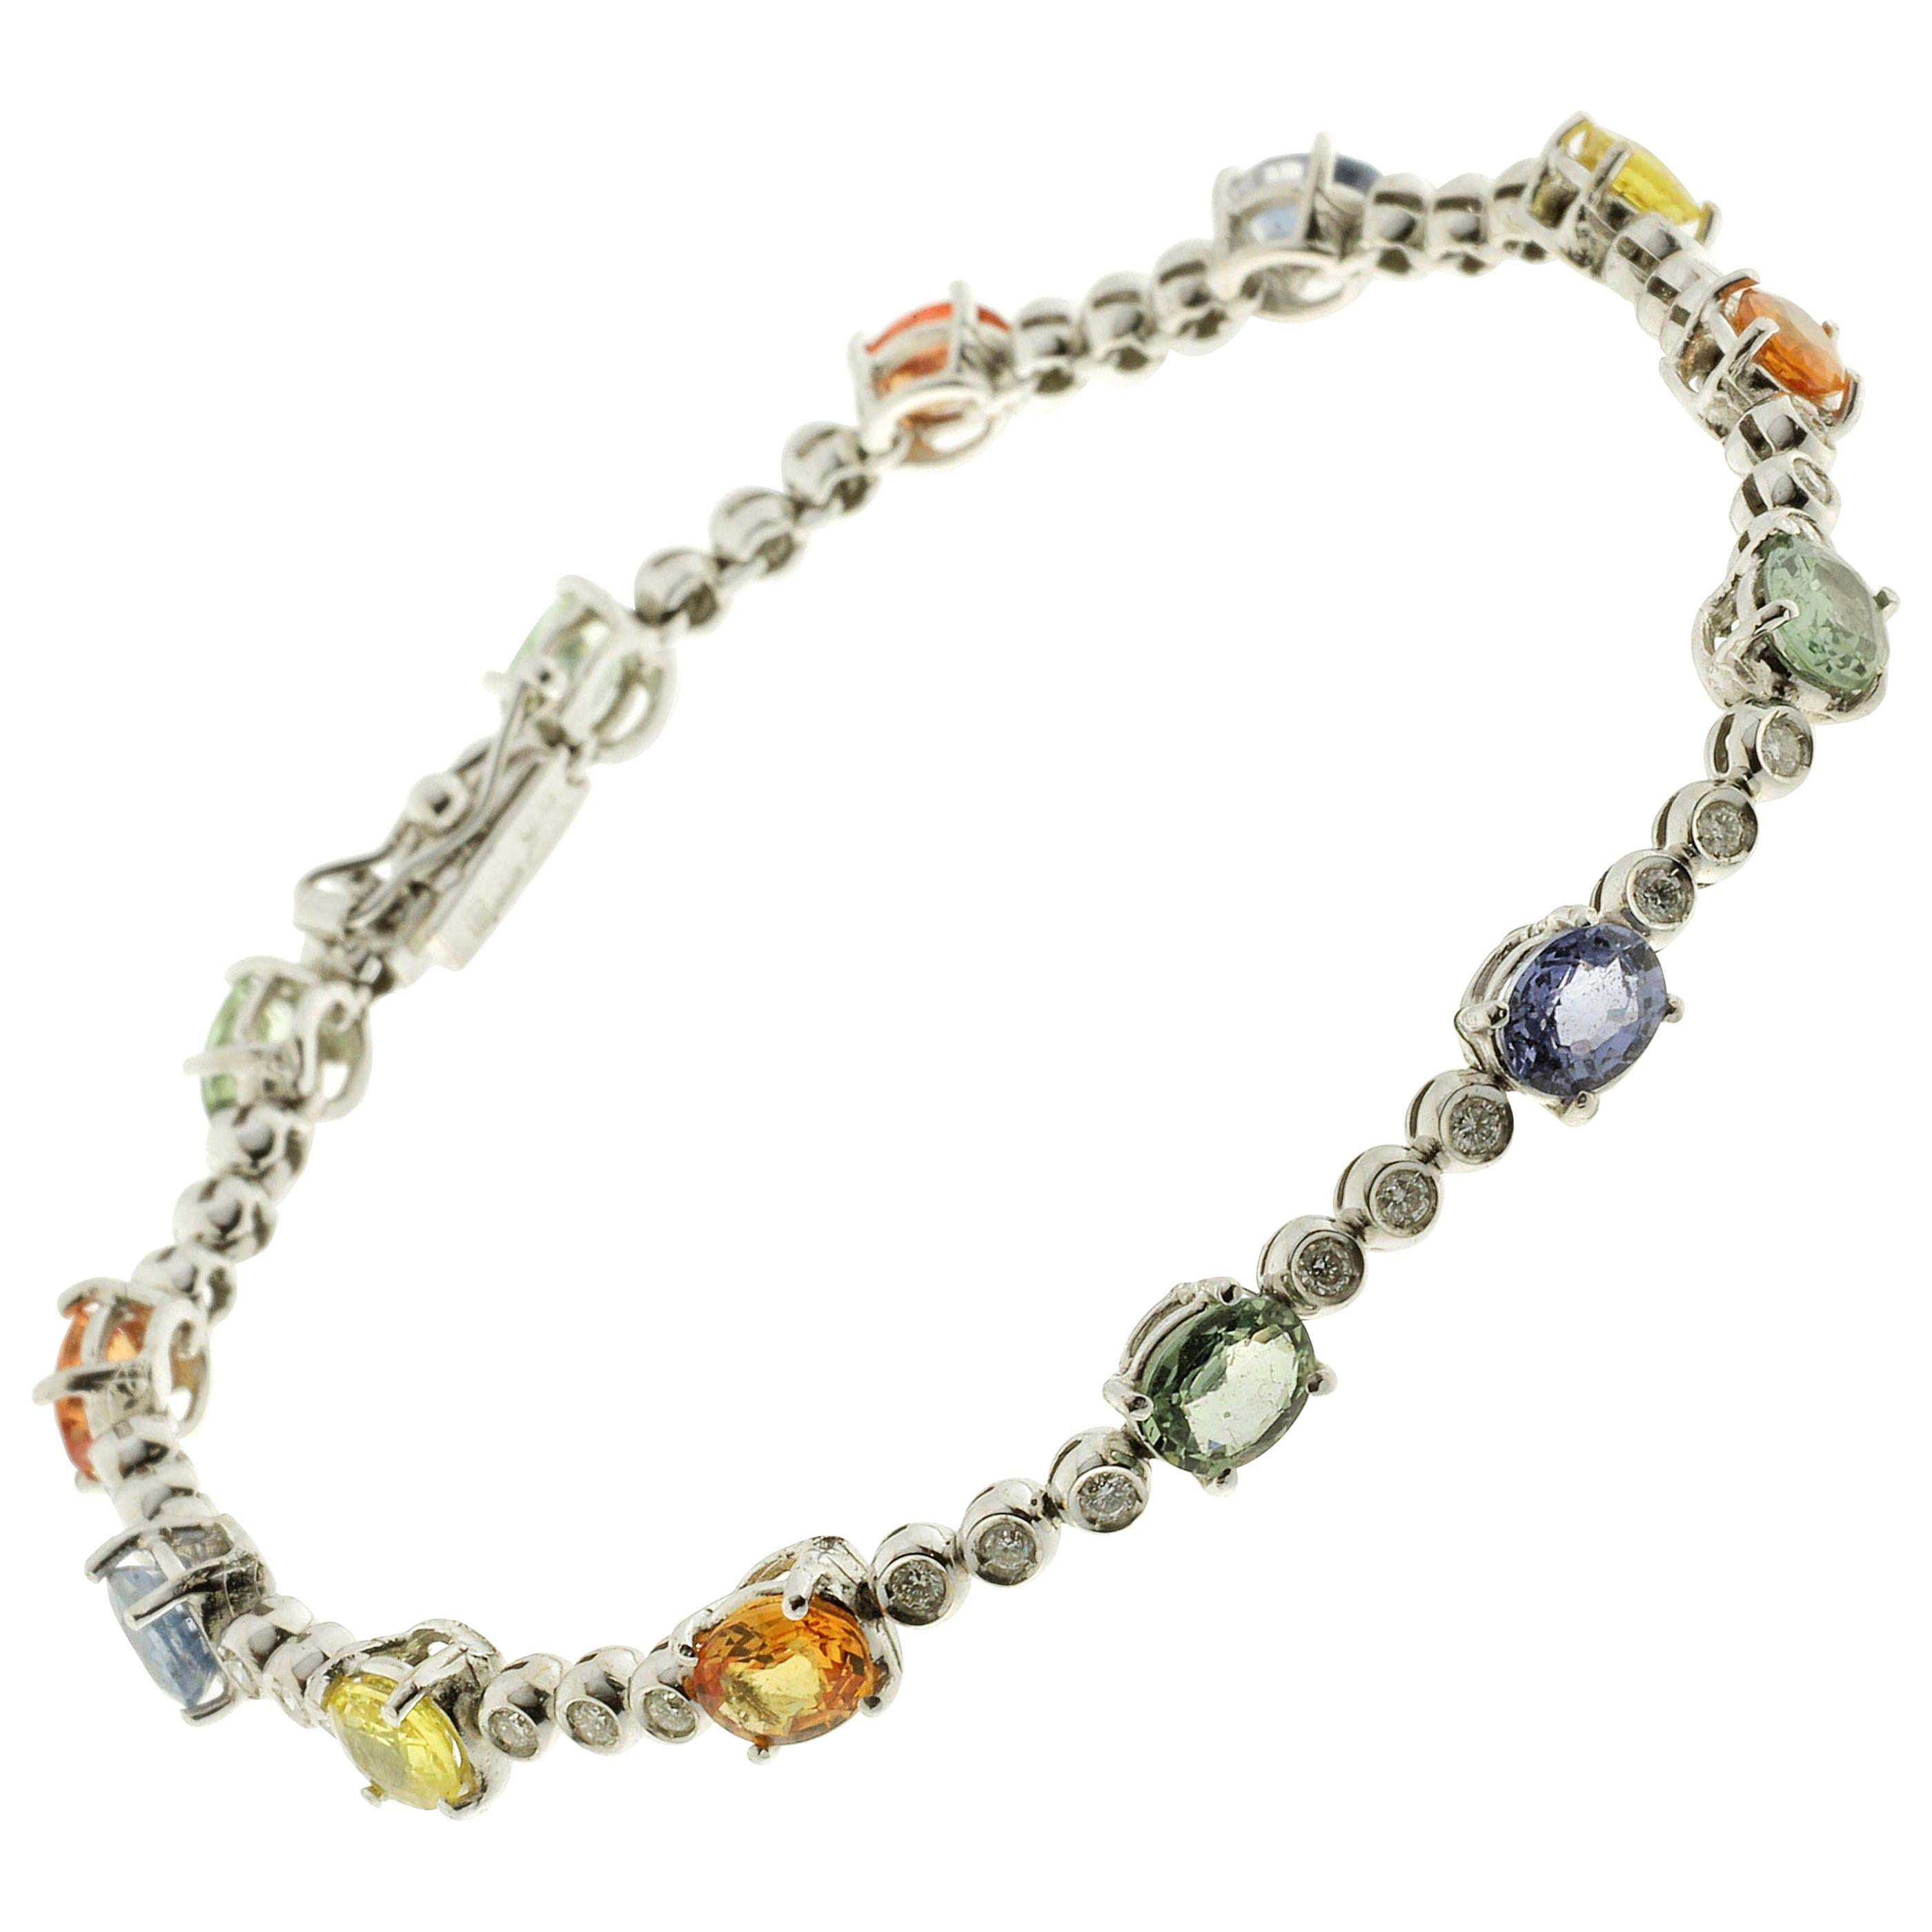 18 Karat White Gold Tennis Bracelet with Diamonds and Sapphires